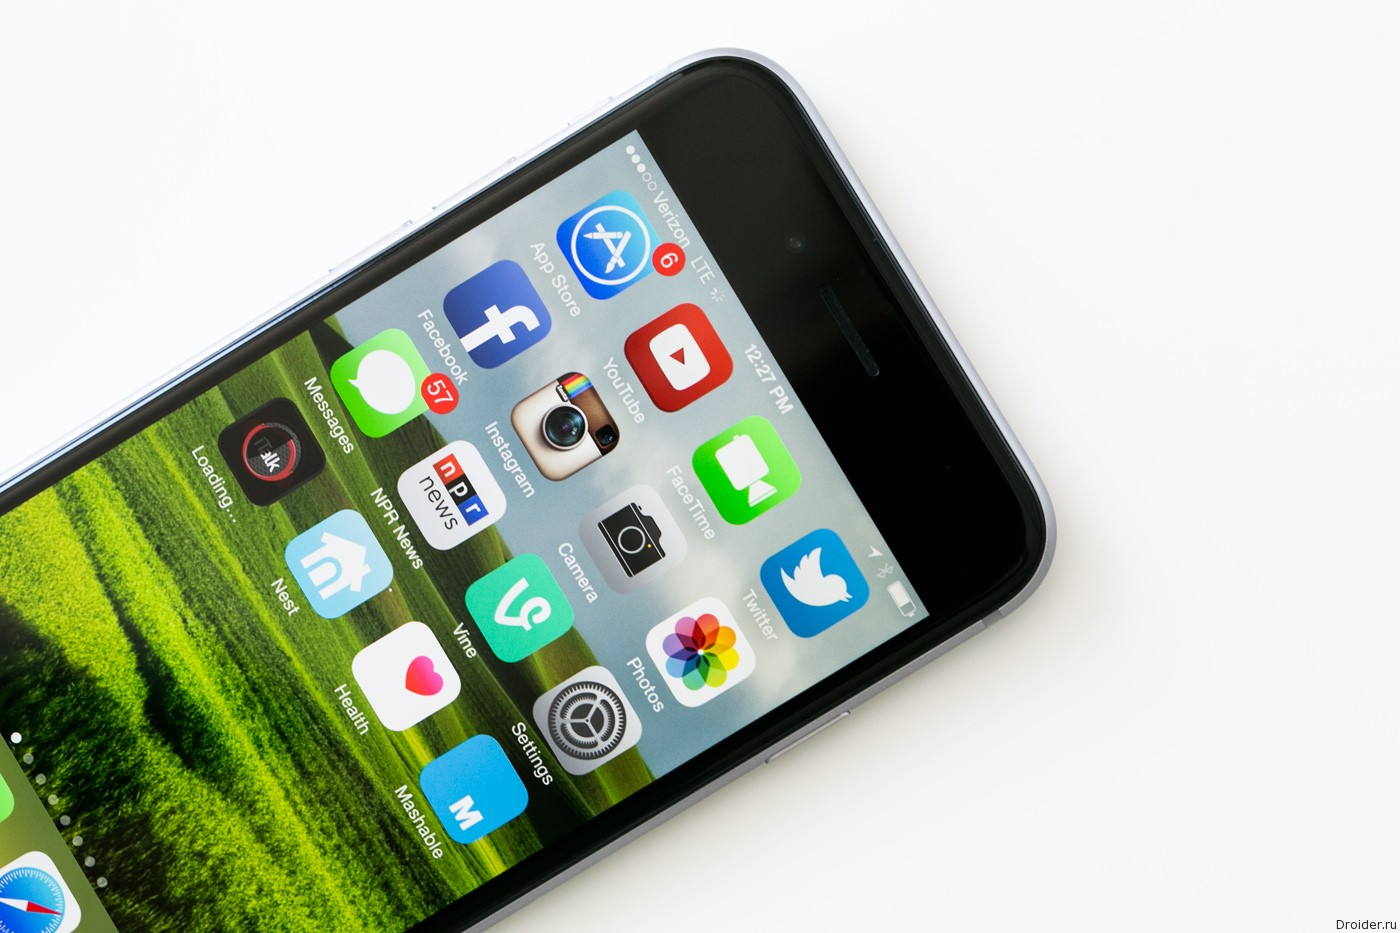 Смартфон iPhone 6 от Apple на операционной системе iOS 8